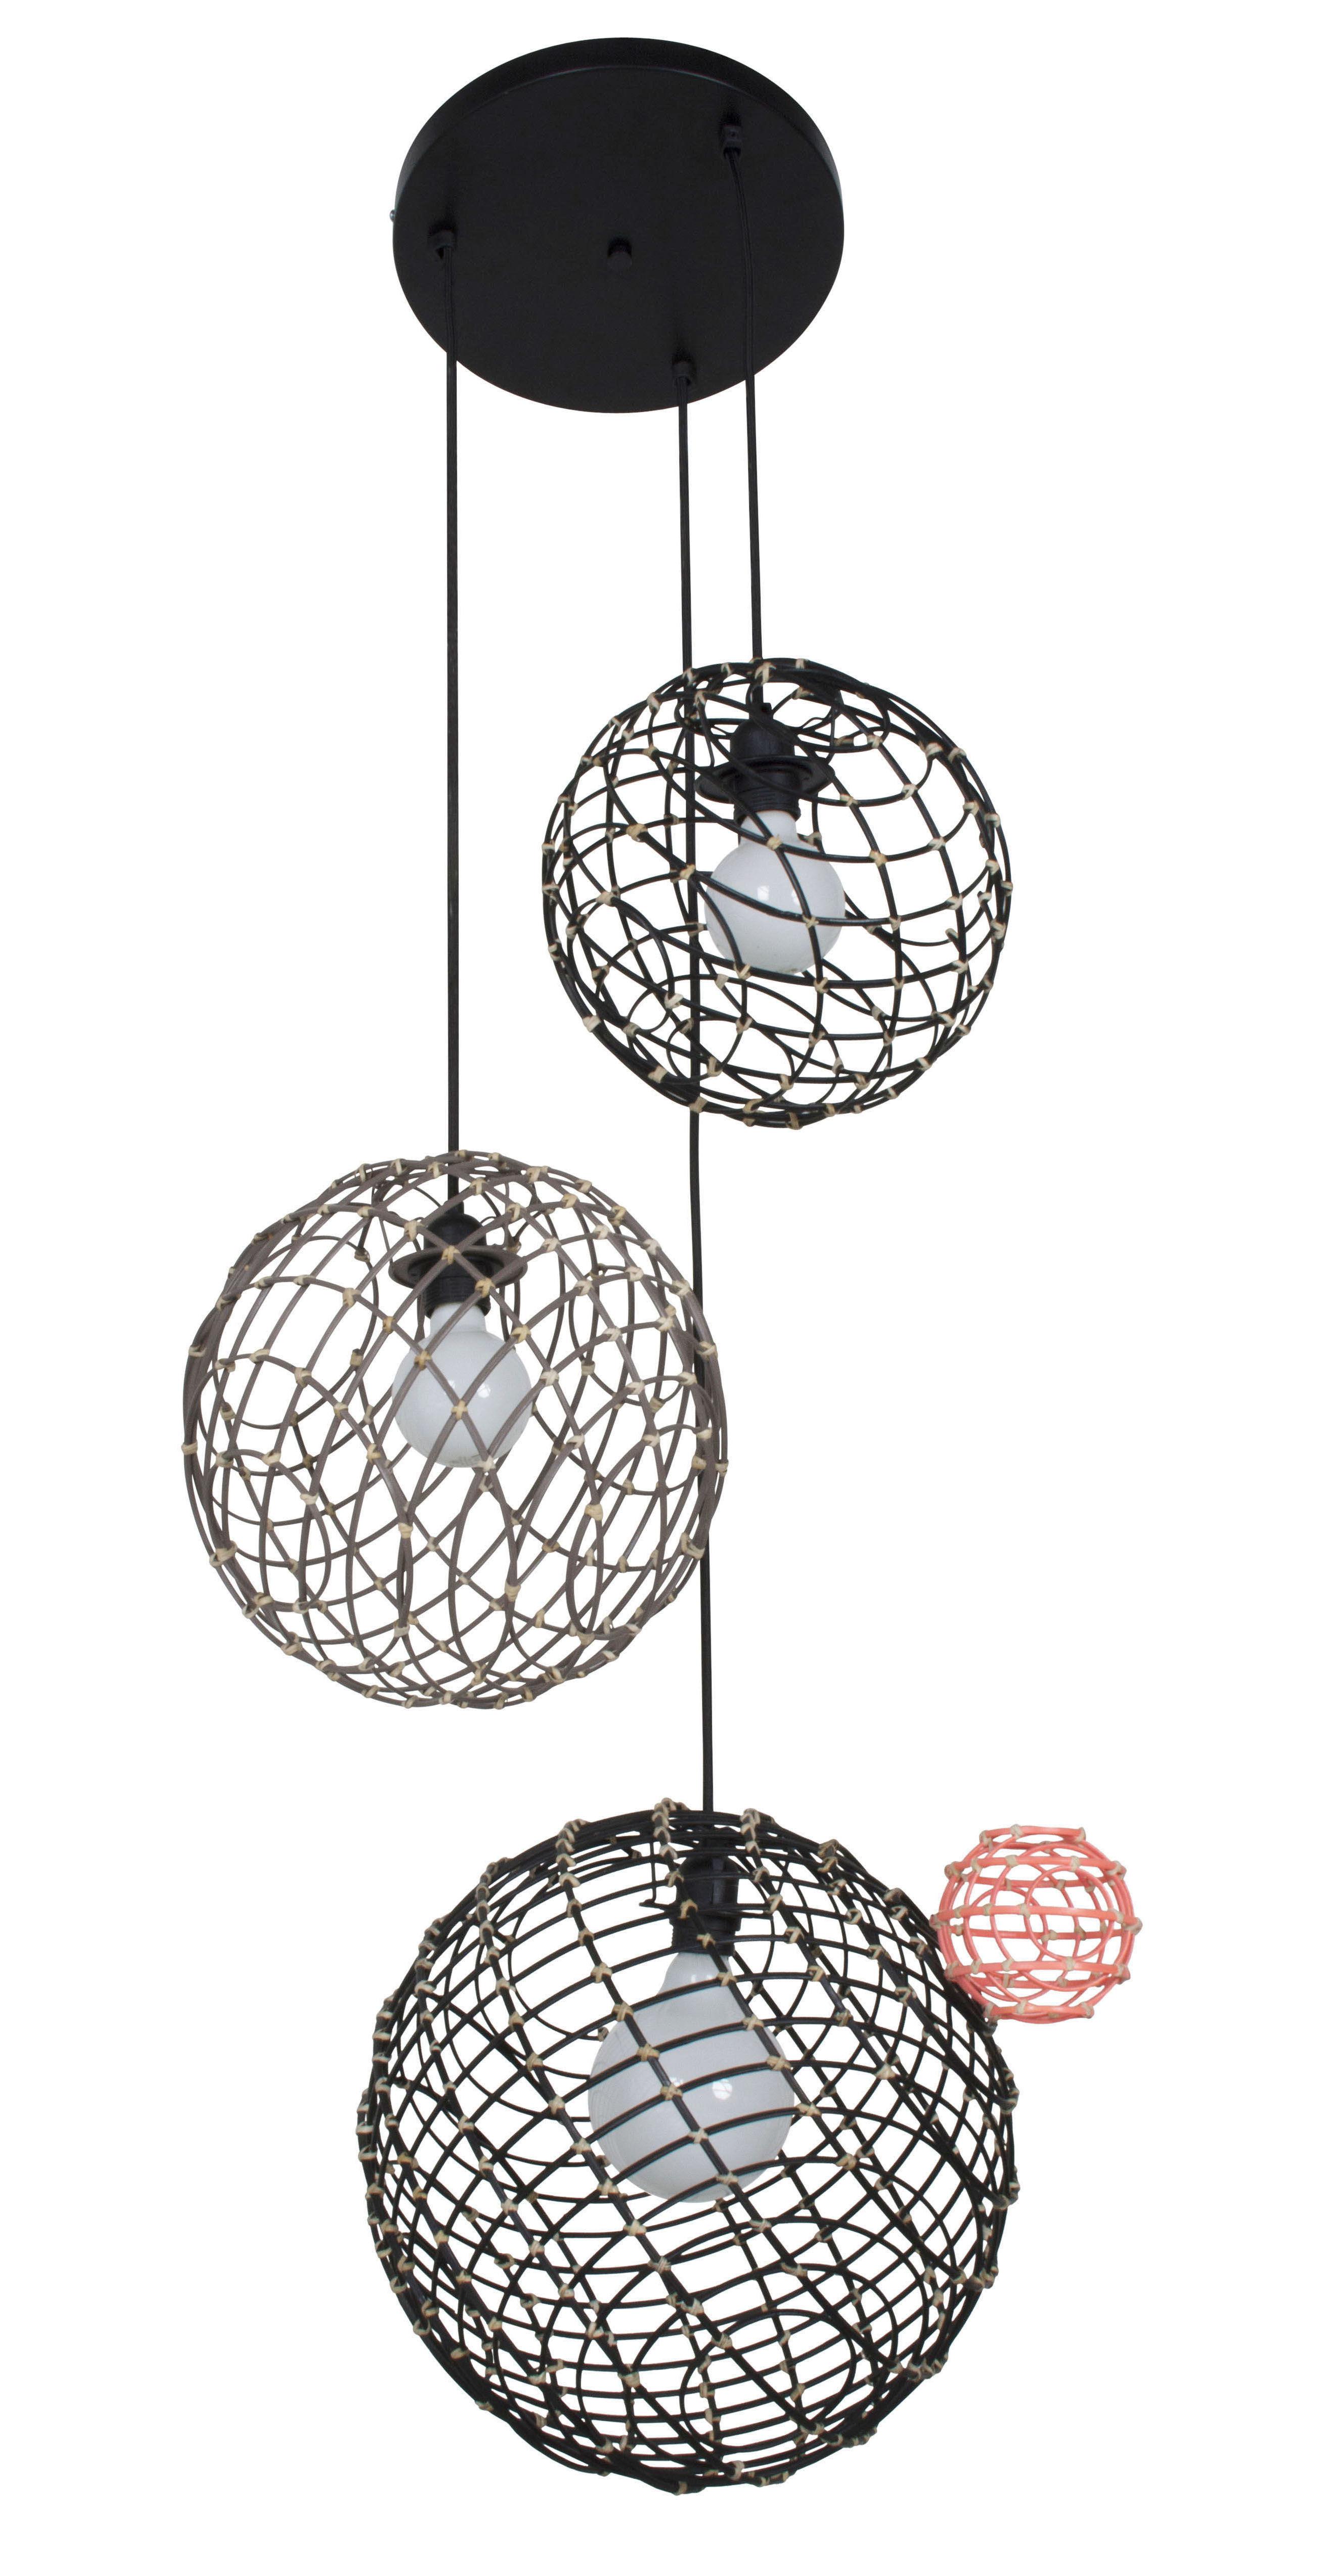 Luminaire - Suspensions - Suspension Sphere Multiple / Bambou - Set 3 sphères - Forestier - Noir & taupe - Bambou